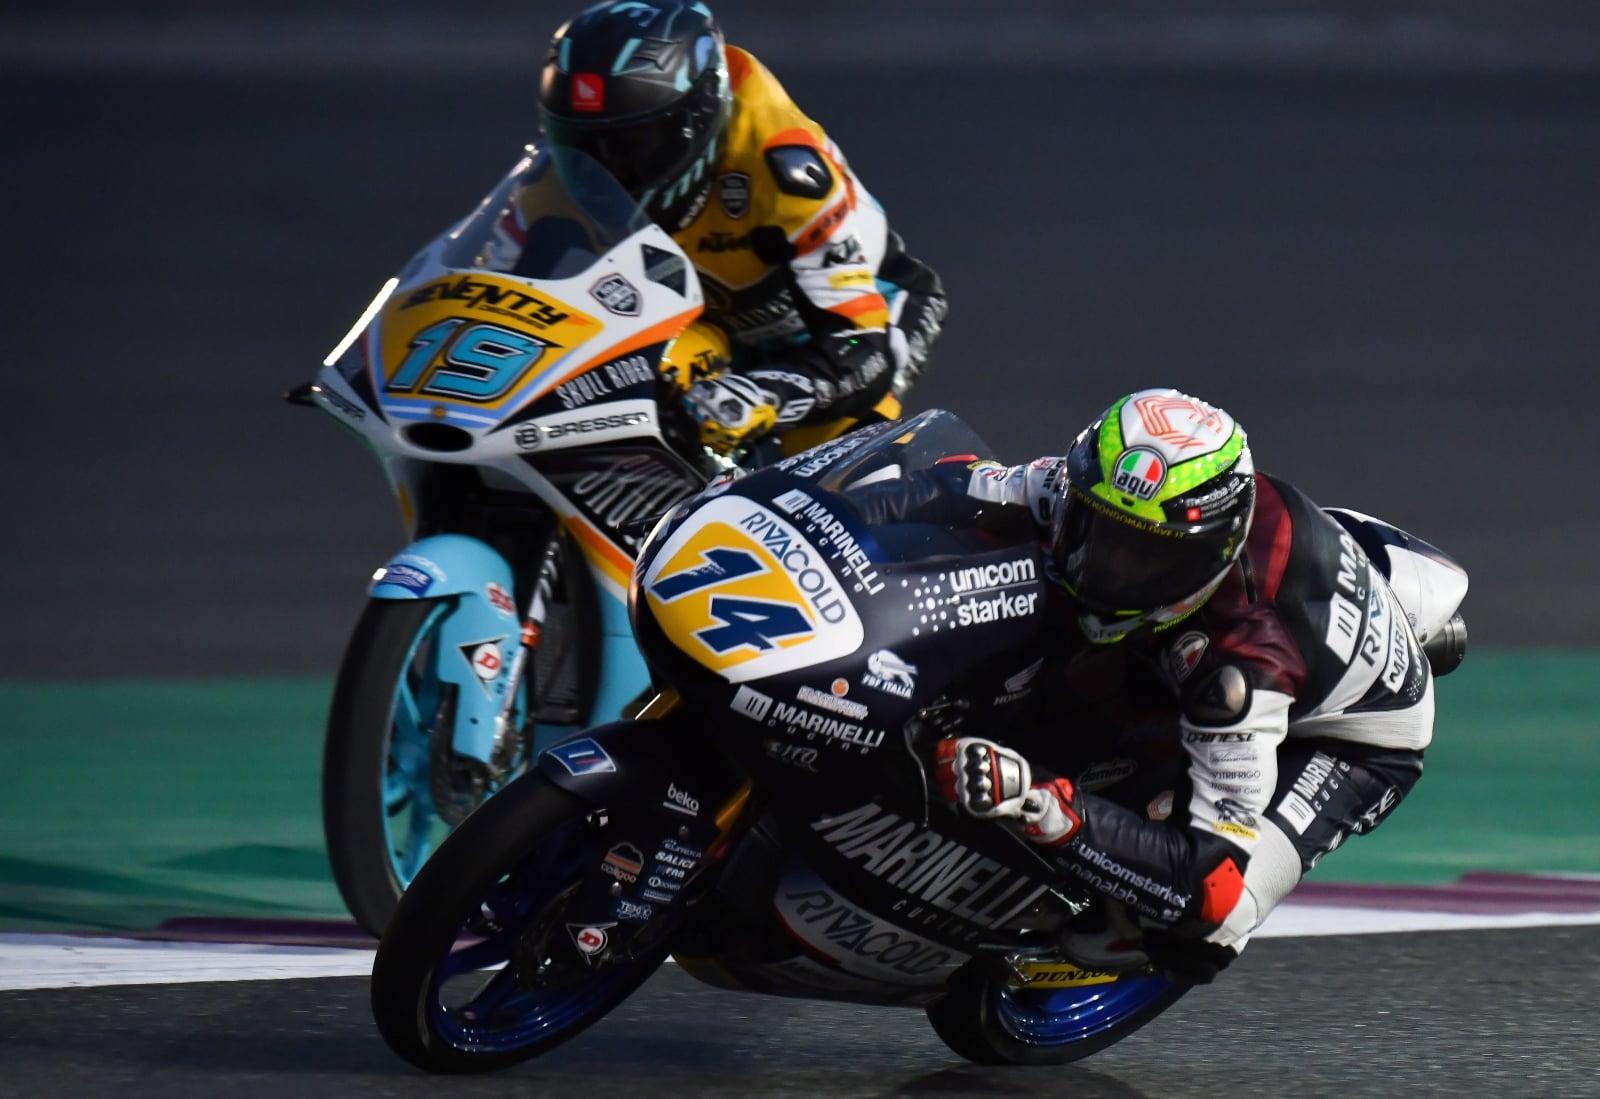 Motocykolwe Grand Prix w Katarze fot. EPA/NOUSHAD THEKKAIL